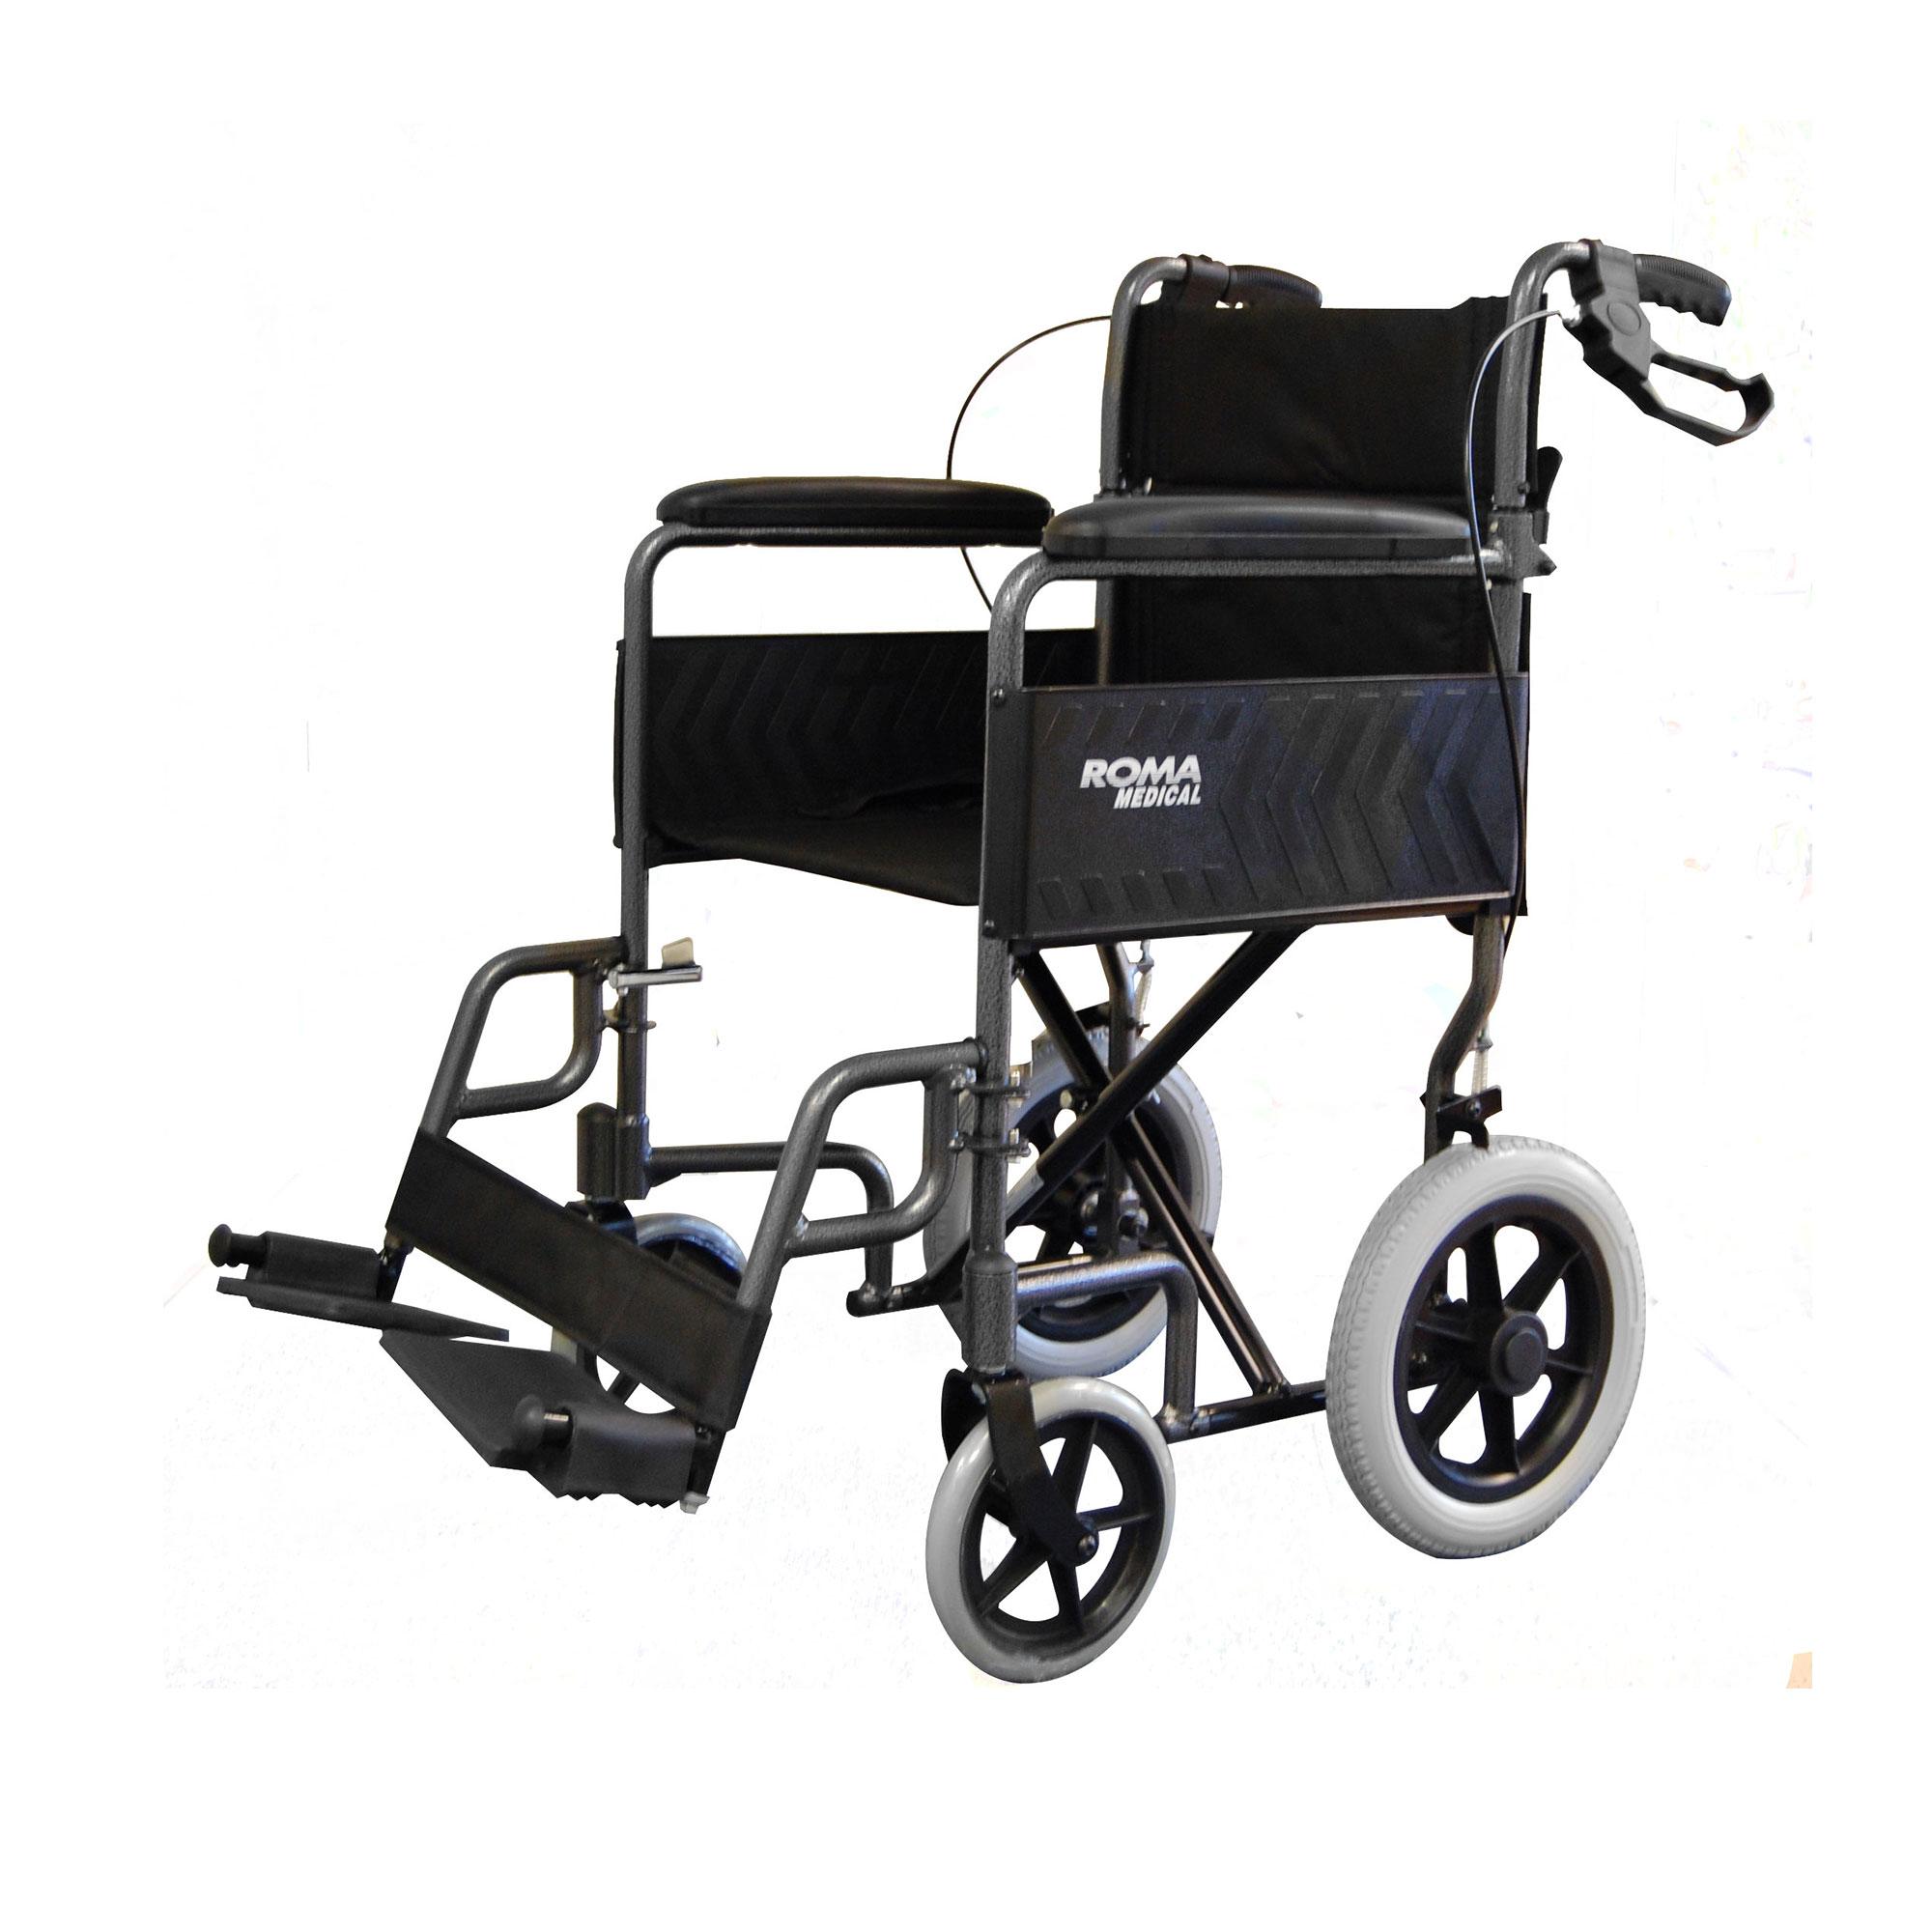 1235 Lightweight Car Transit Wheelchair Roma Medical